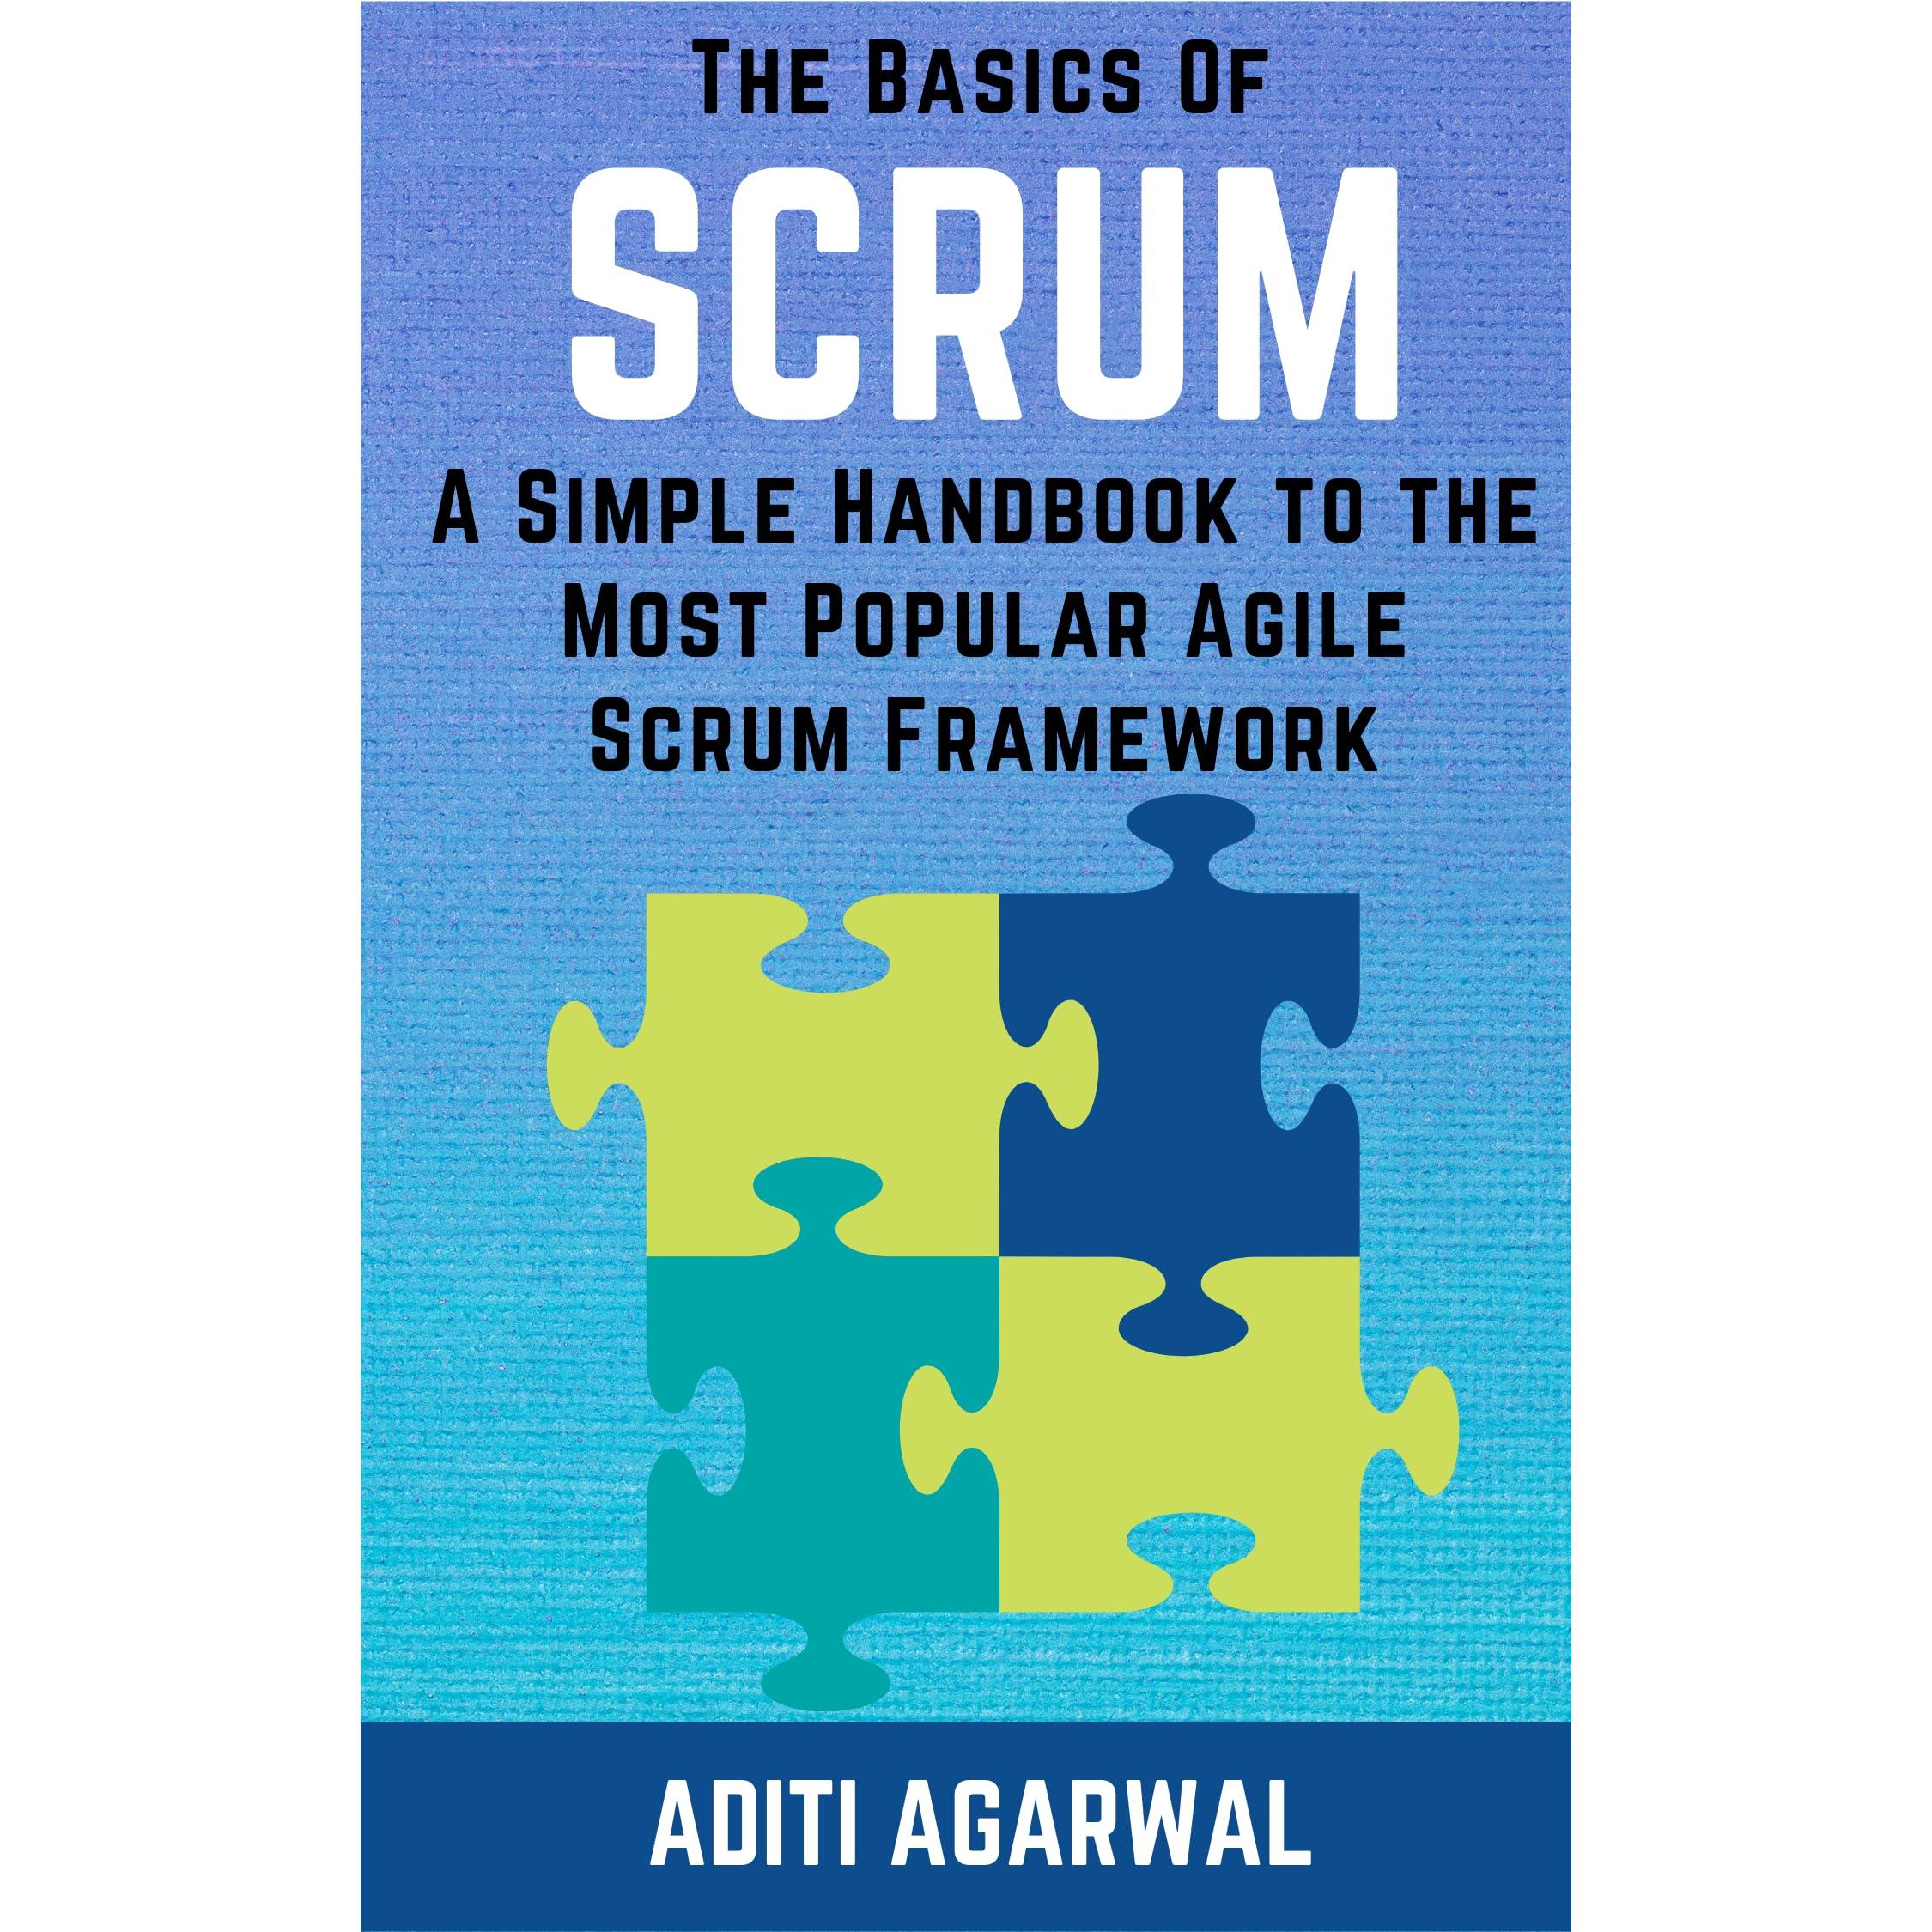 Agile Basics the basics of scrumaditi agarwal